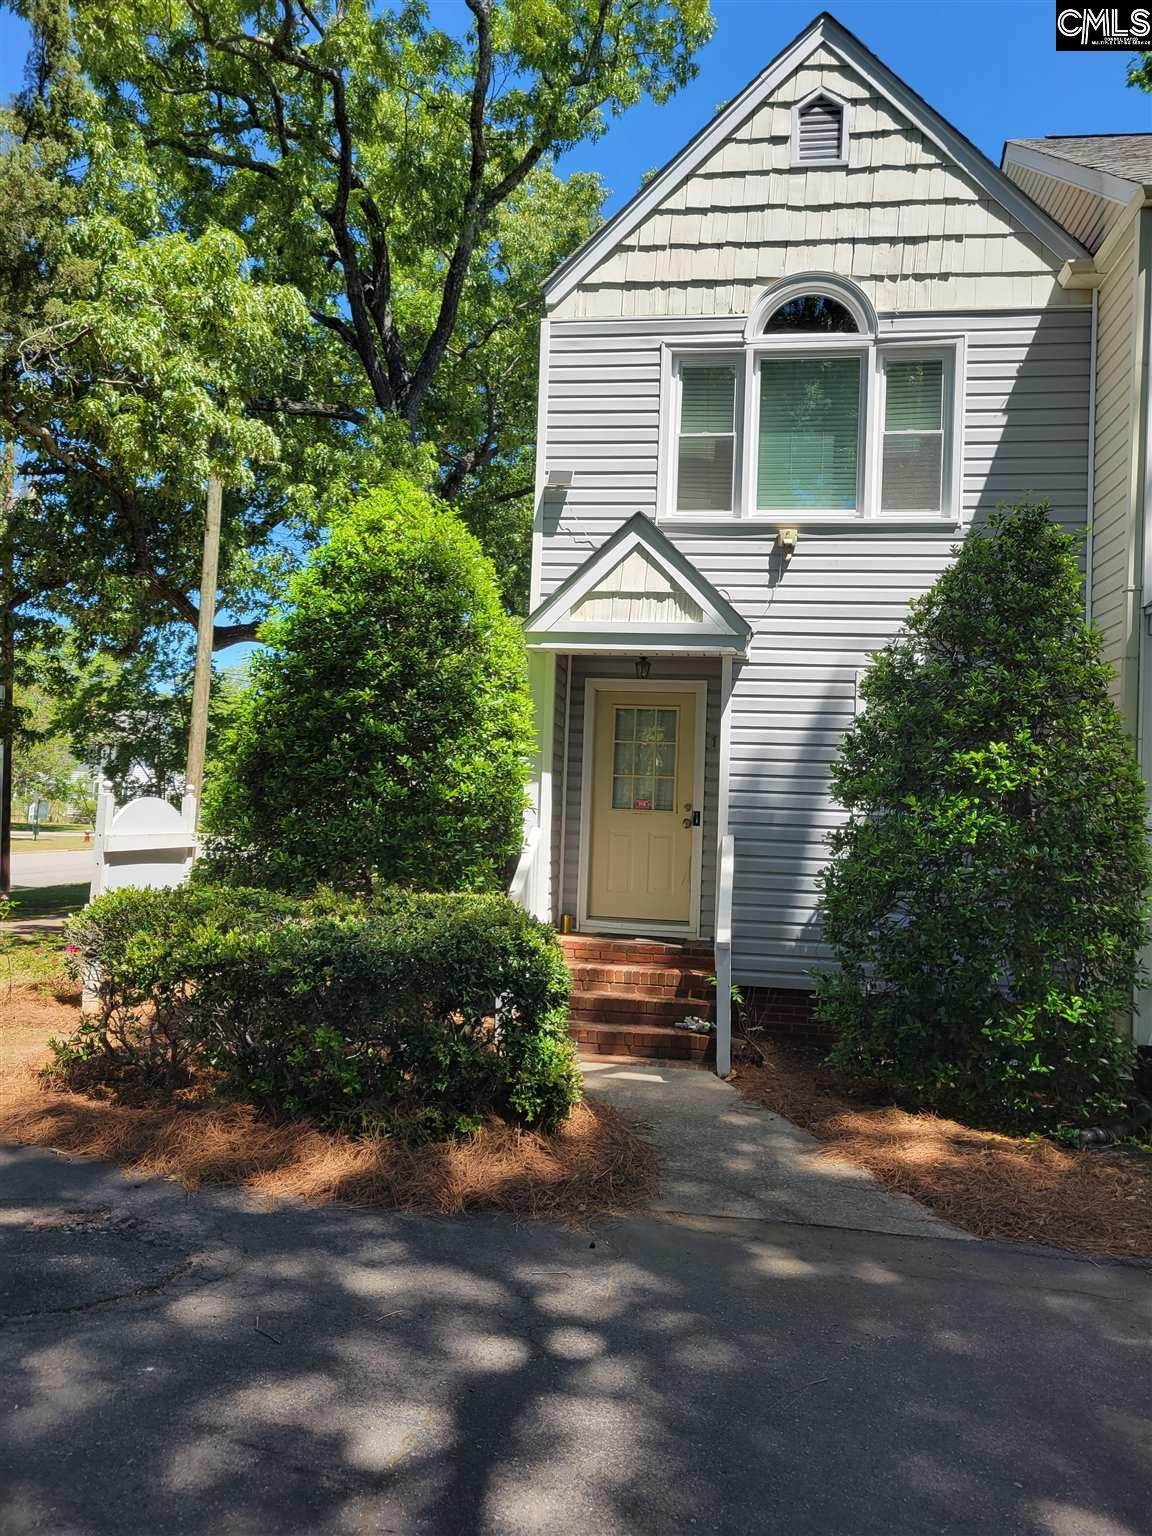 920 Woodrow Street 1 - Photo 1